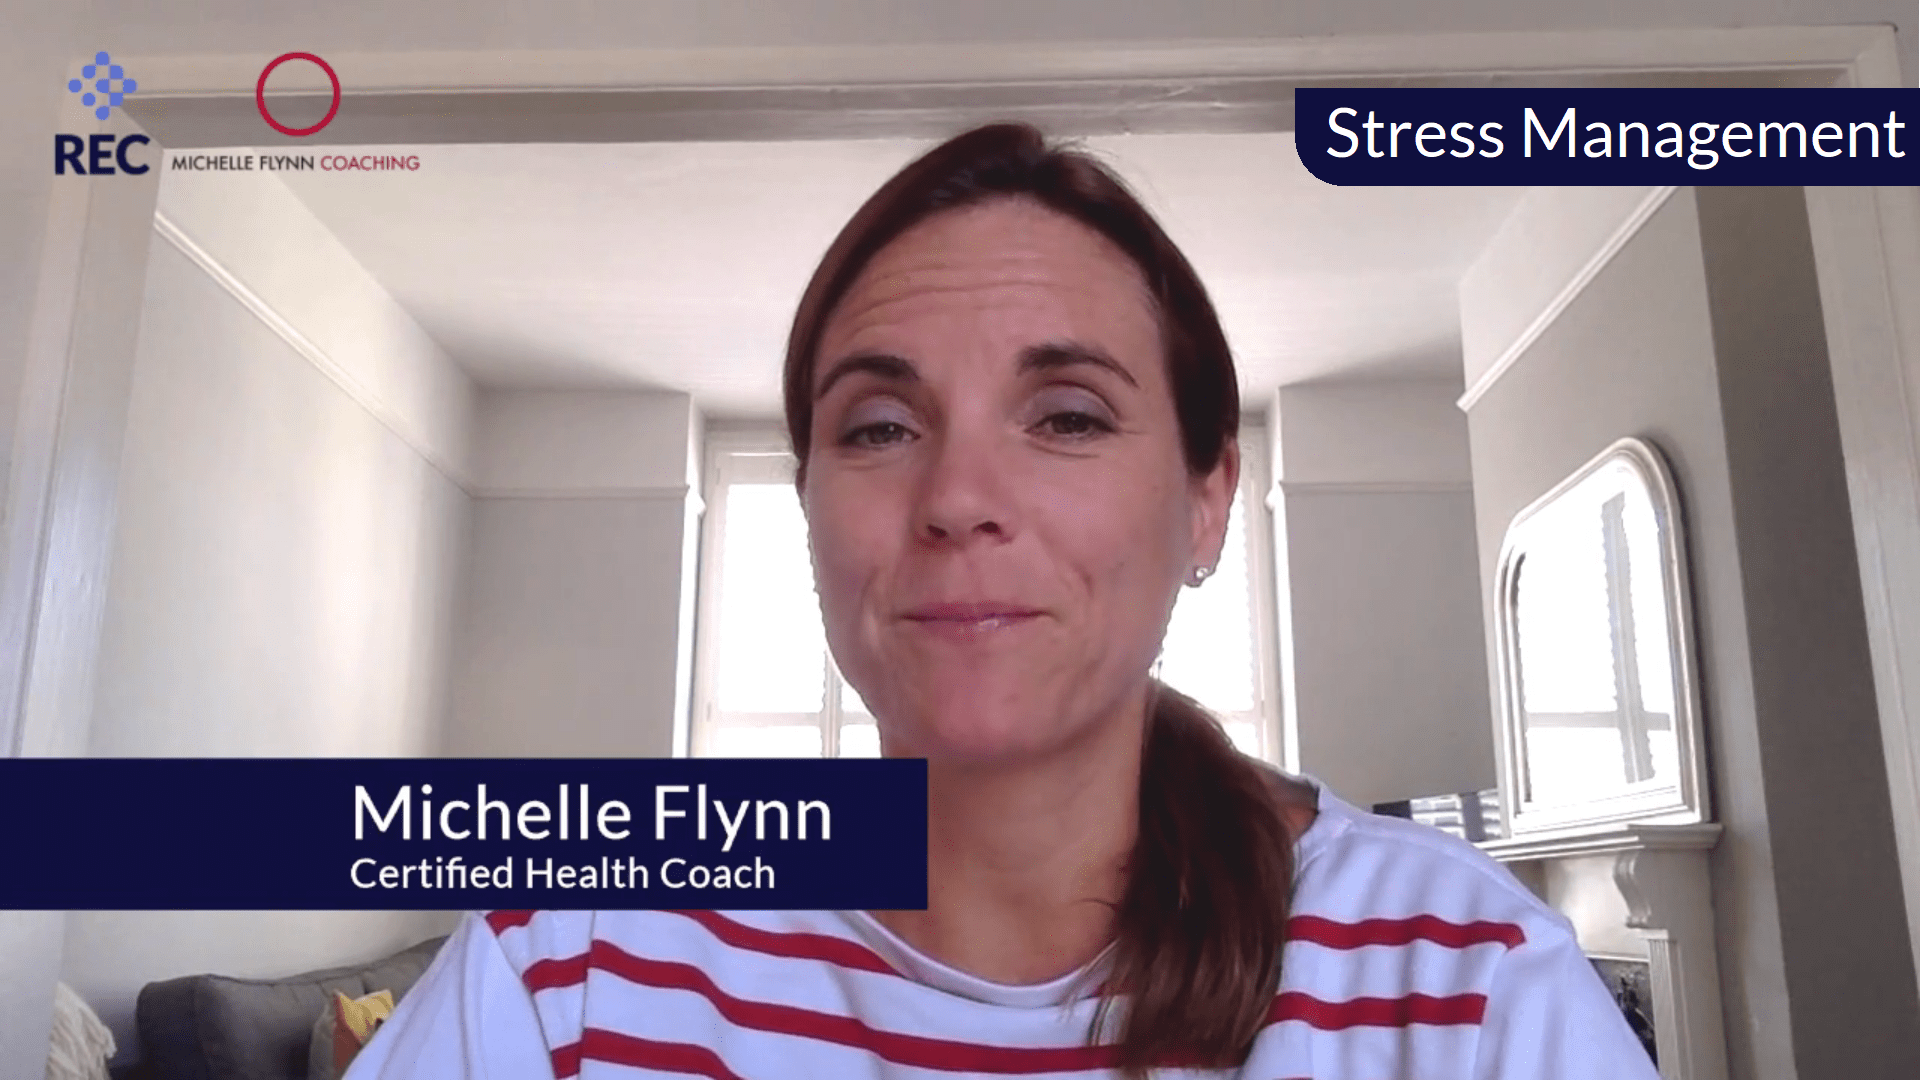 Stress Management, Michelle Flynn